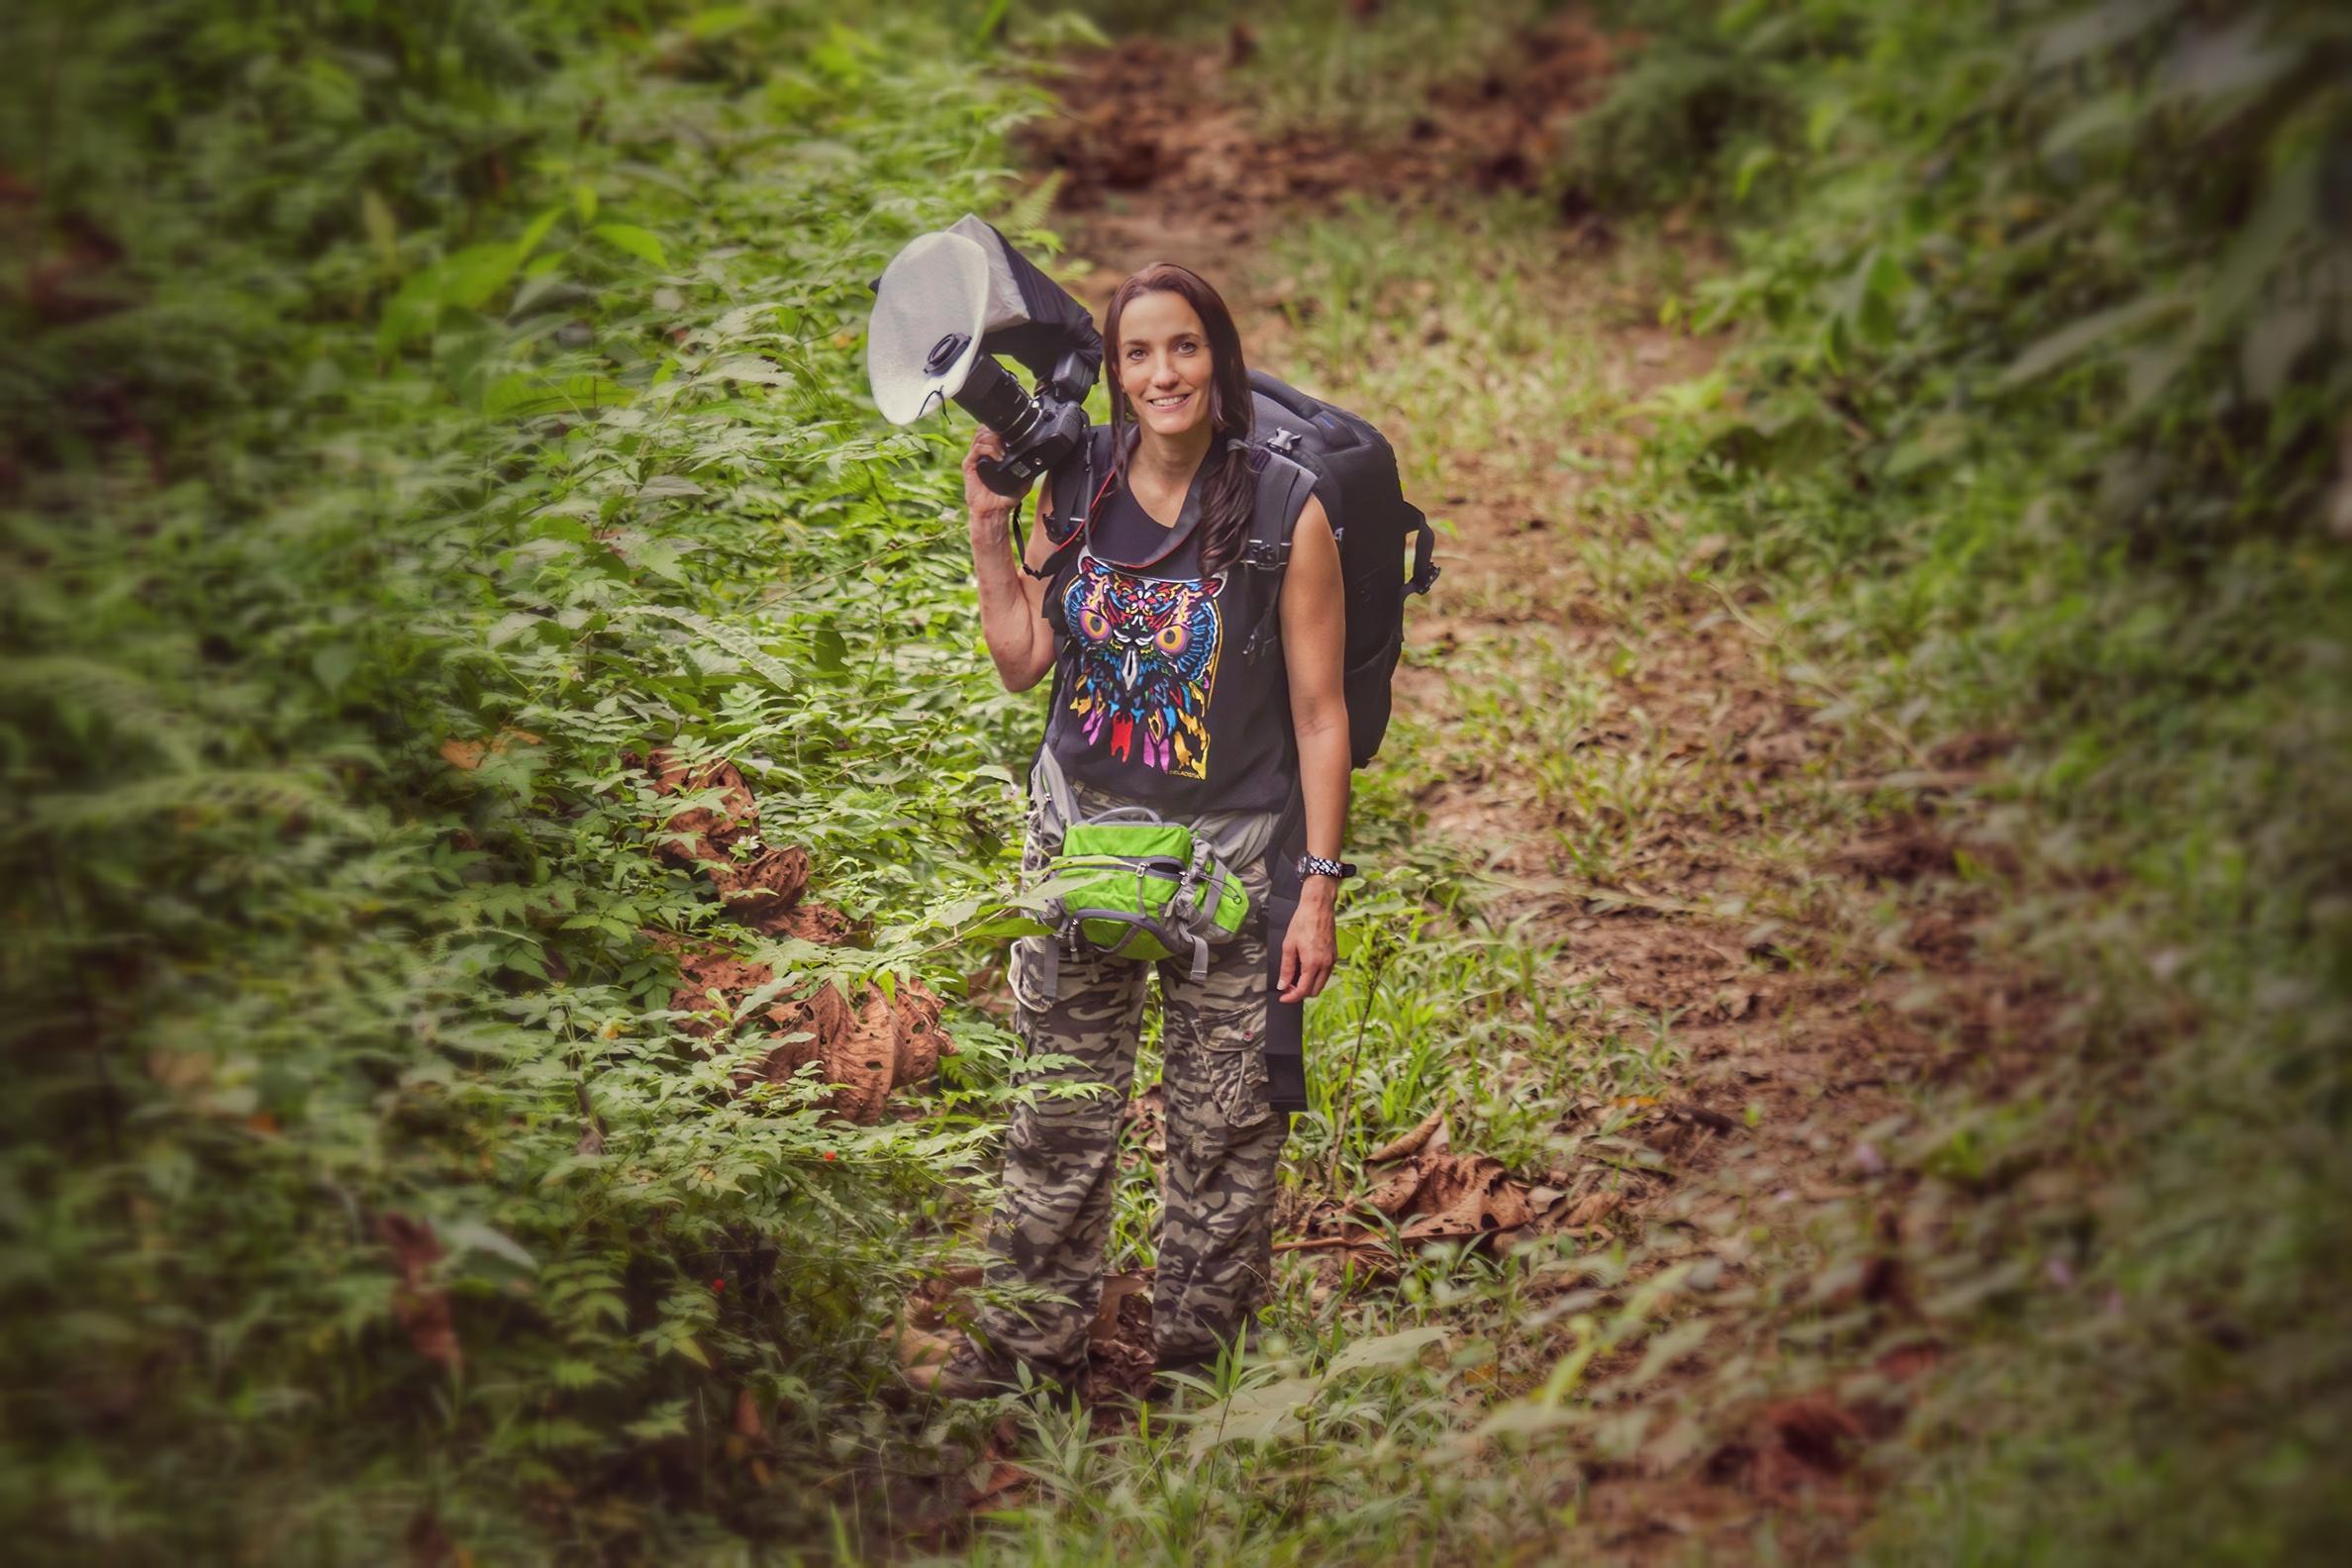 Cynthia Bandurek exploring and photographying in the amazon Jungle of Ecuador